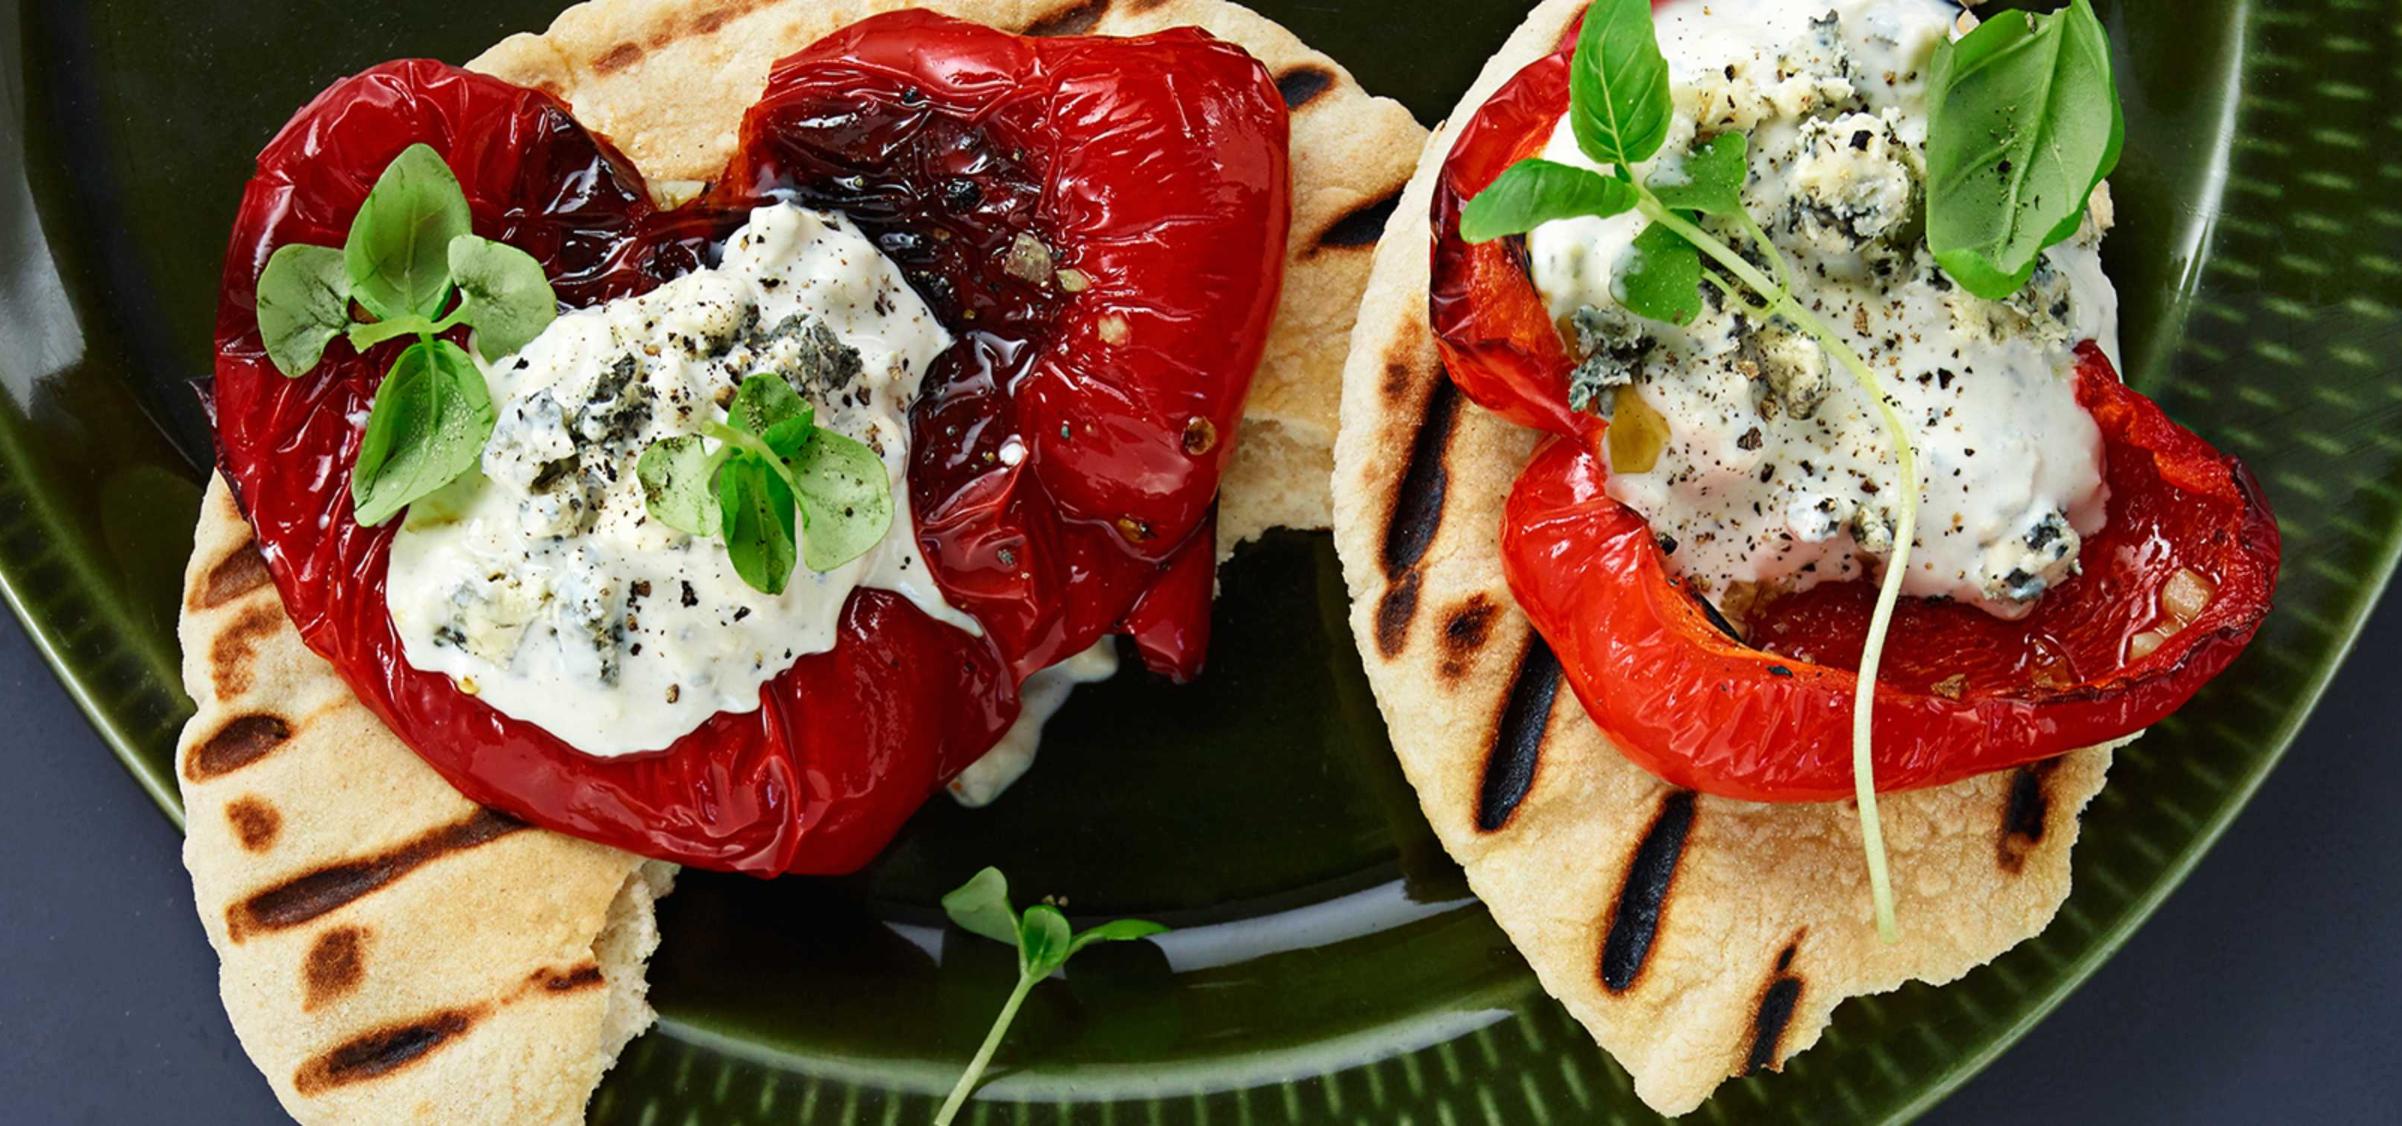 Helgrillet paprika i wrap eller pita, en garantert suksess.